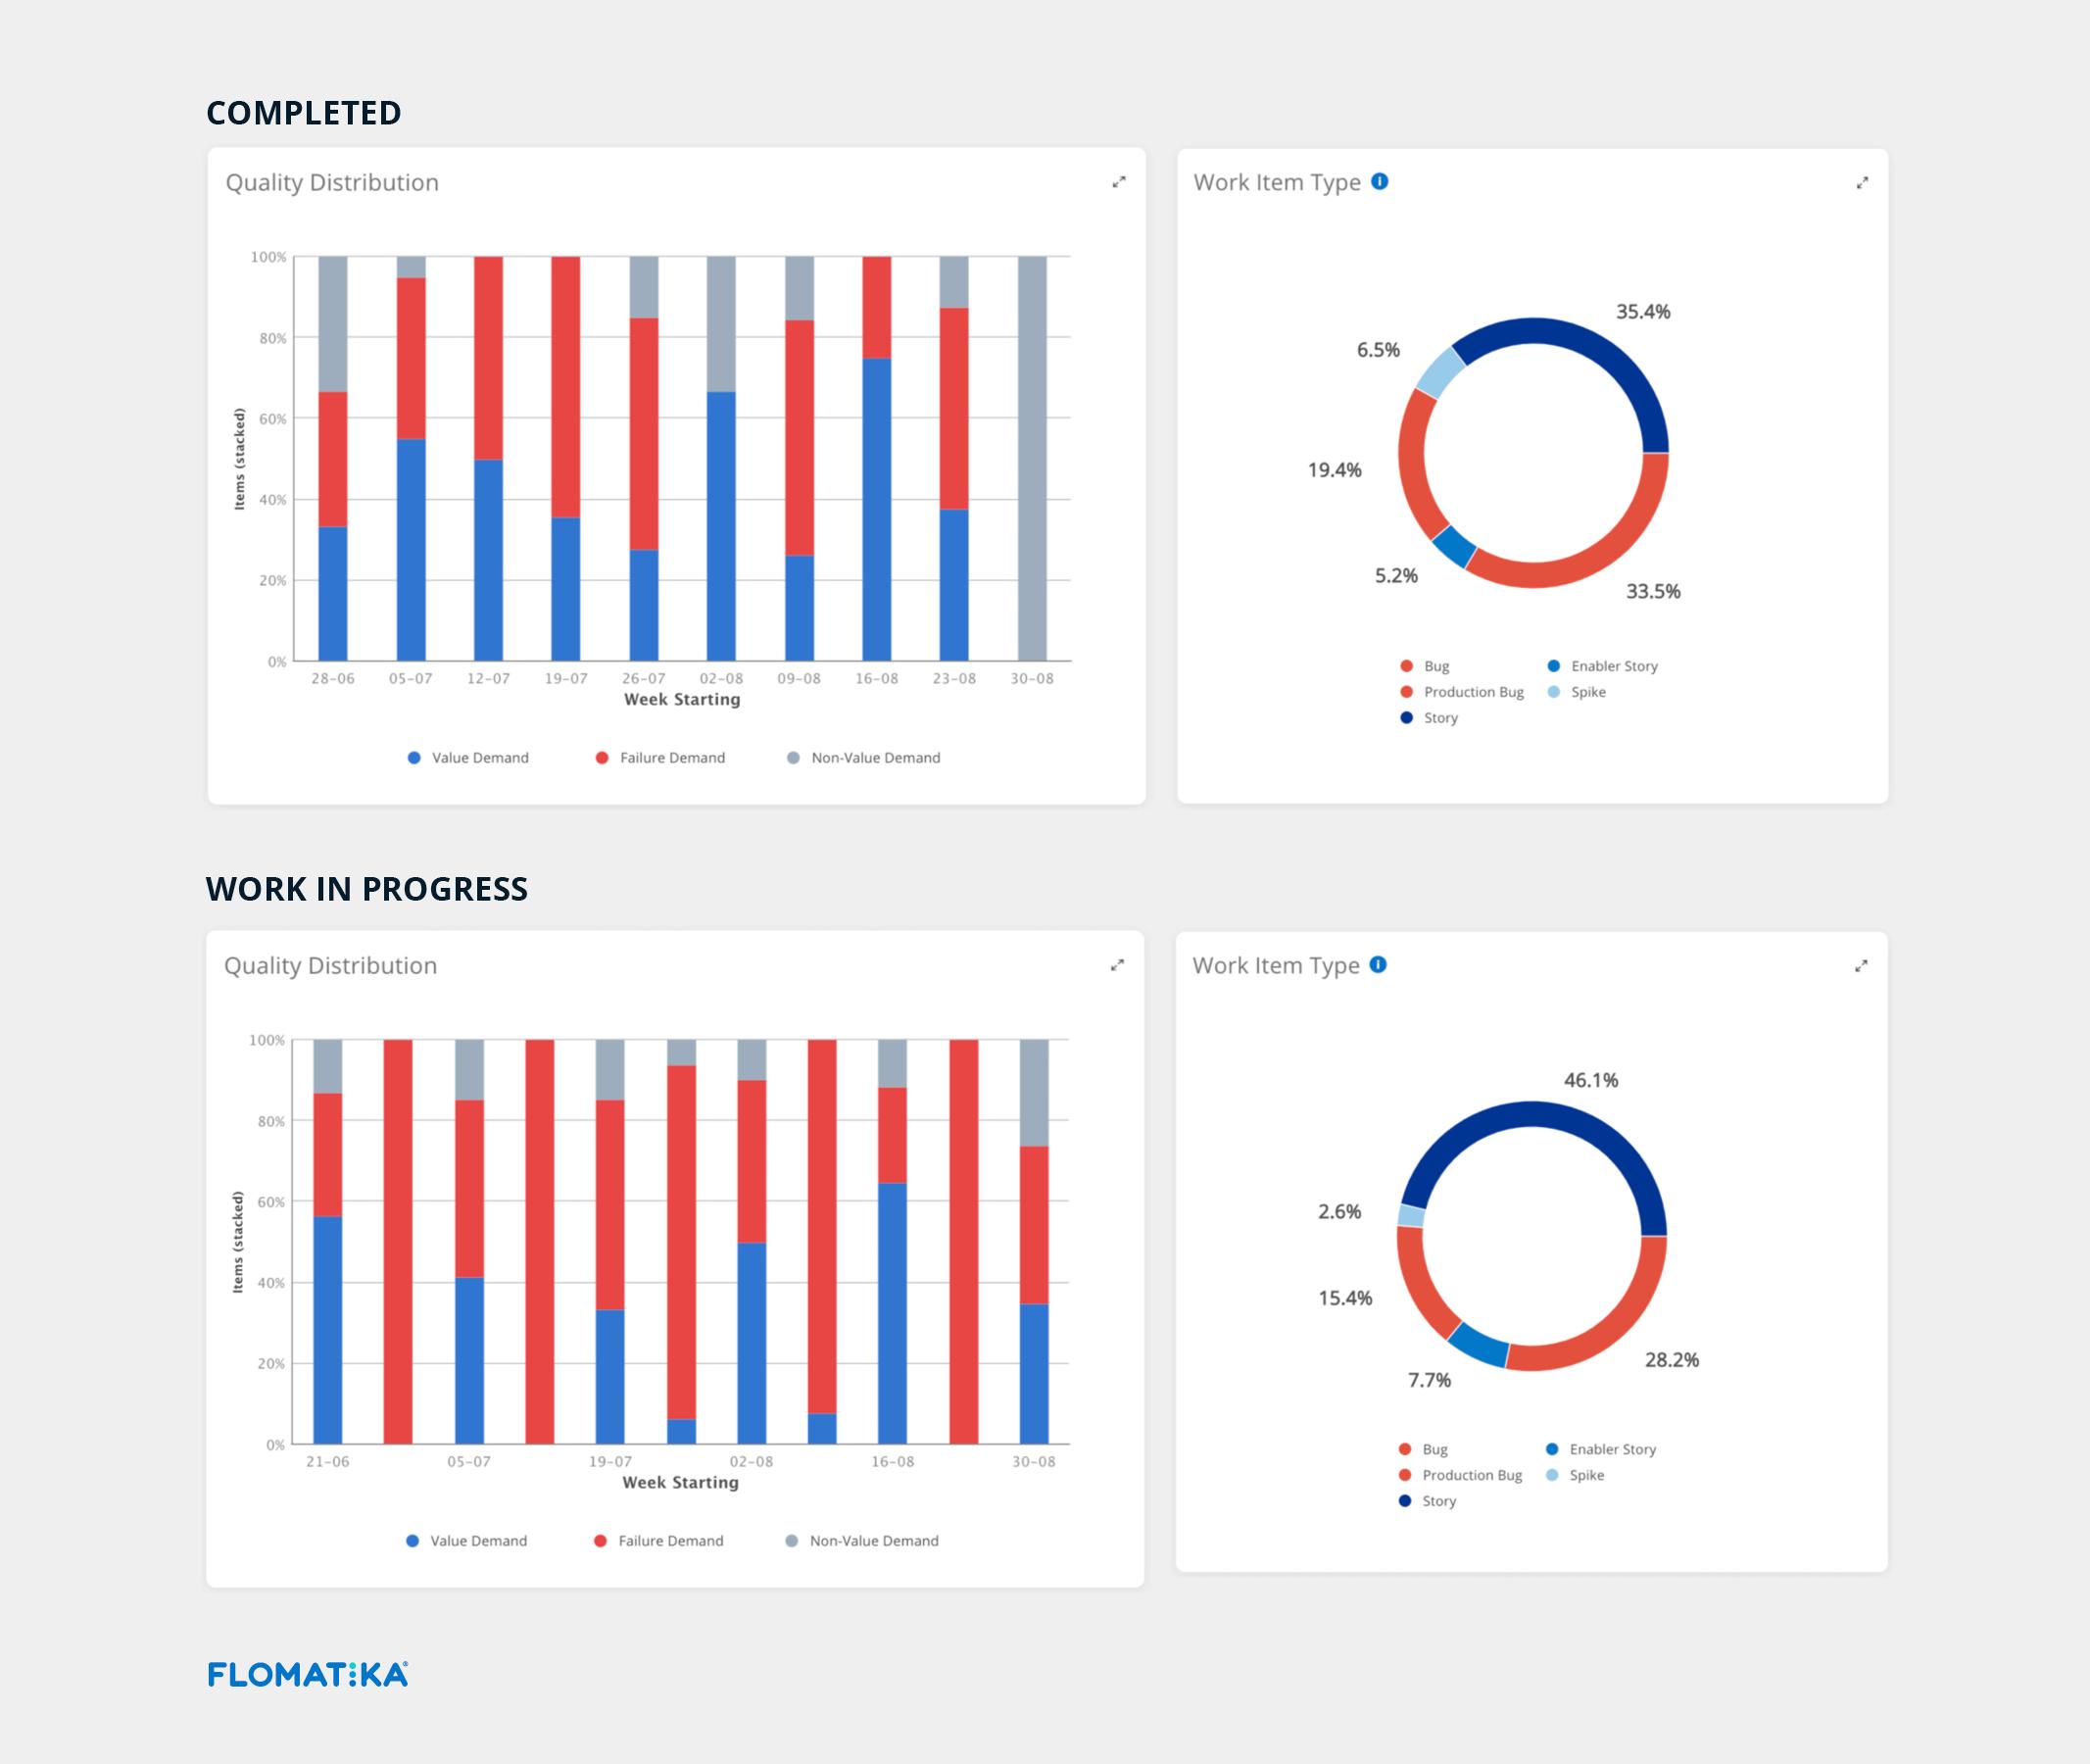 Flomatika Quality Distribution Value Stream